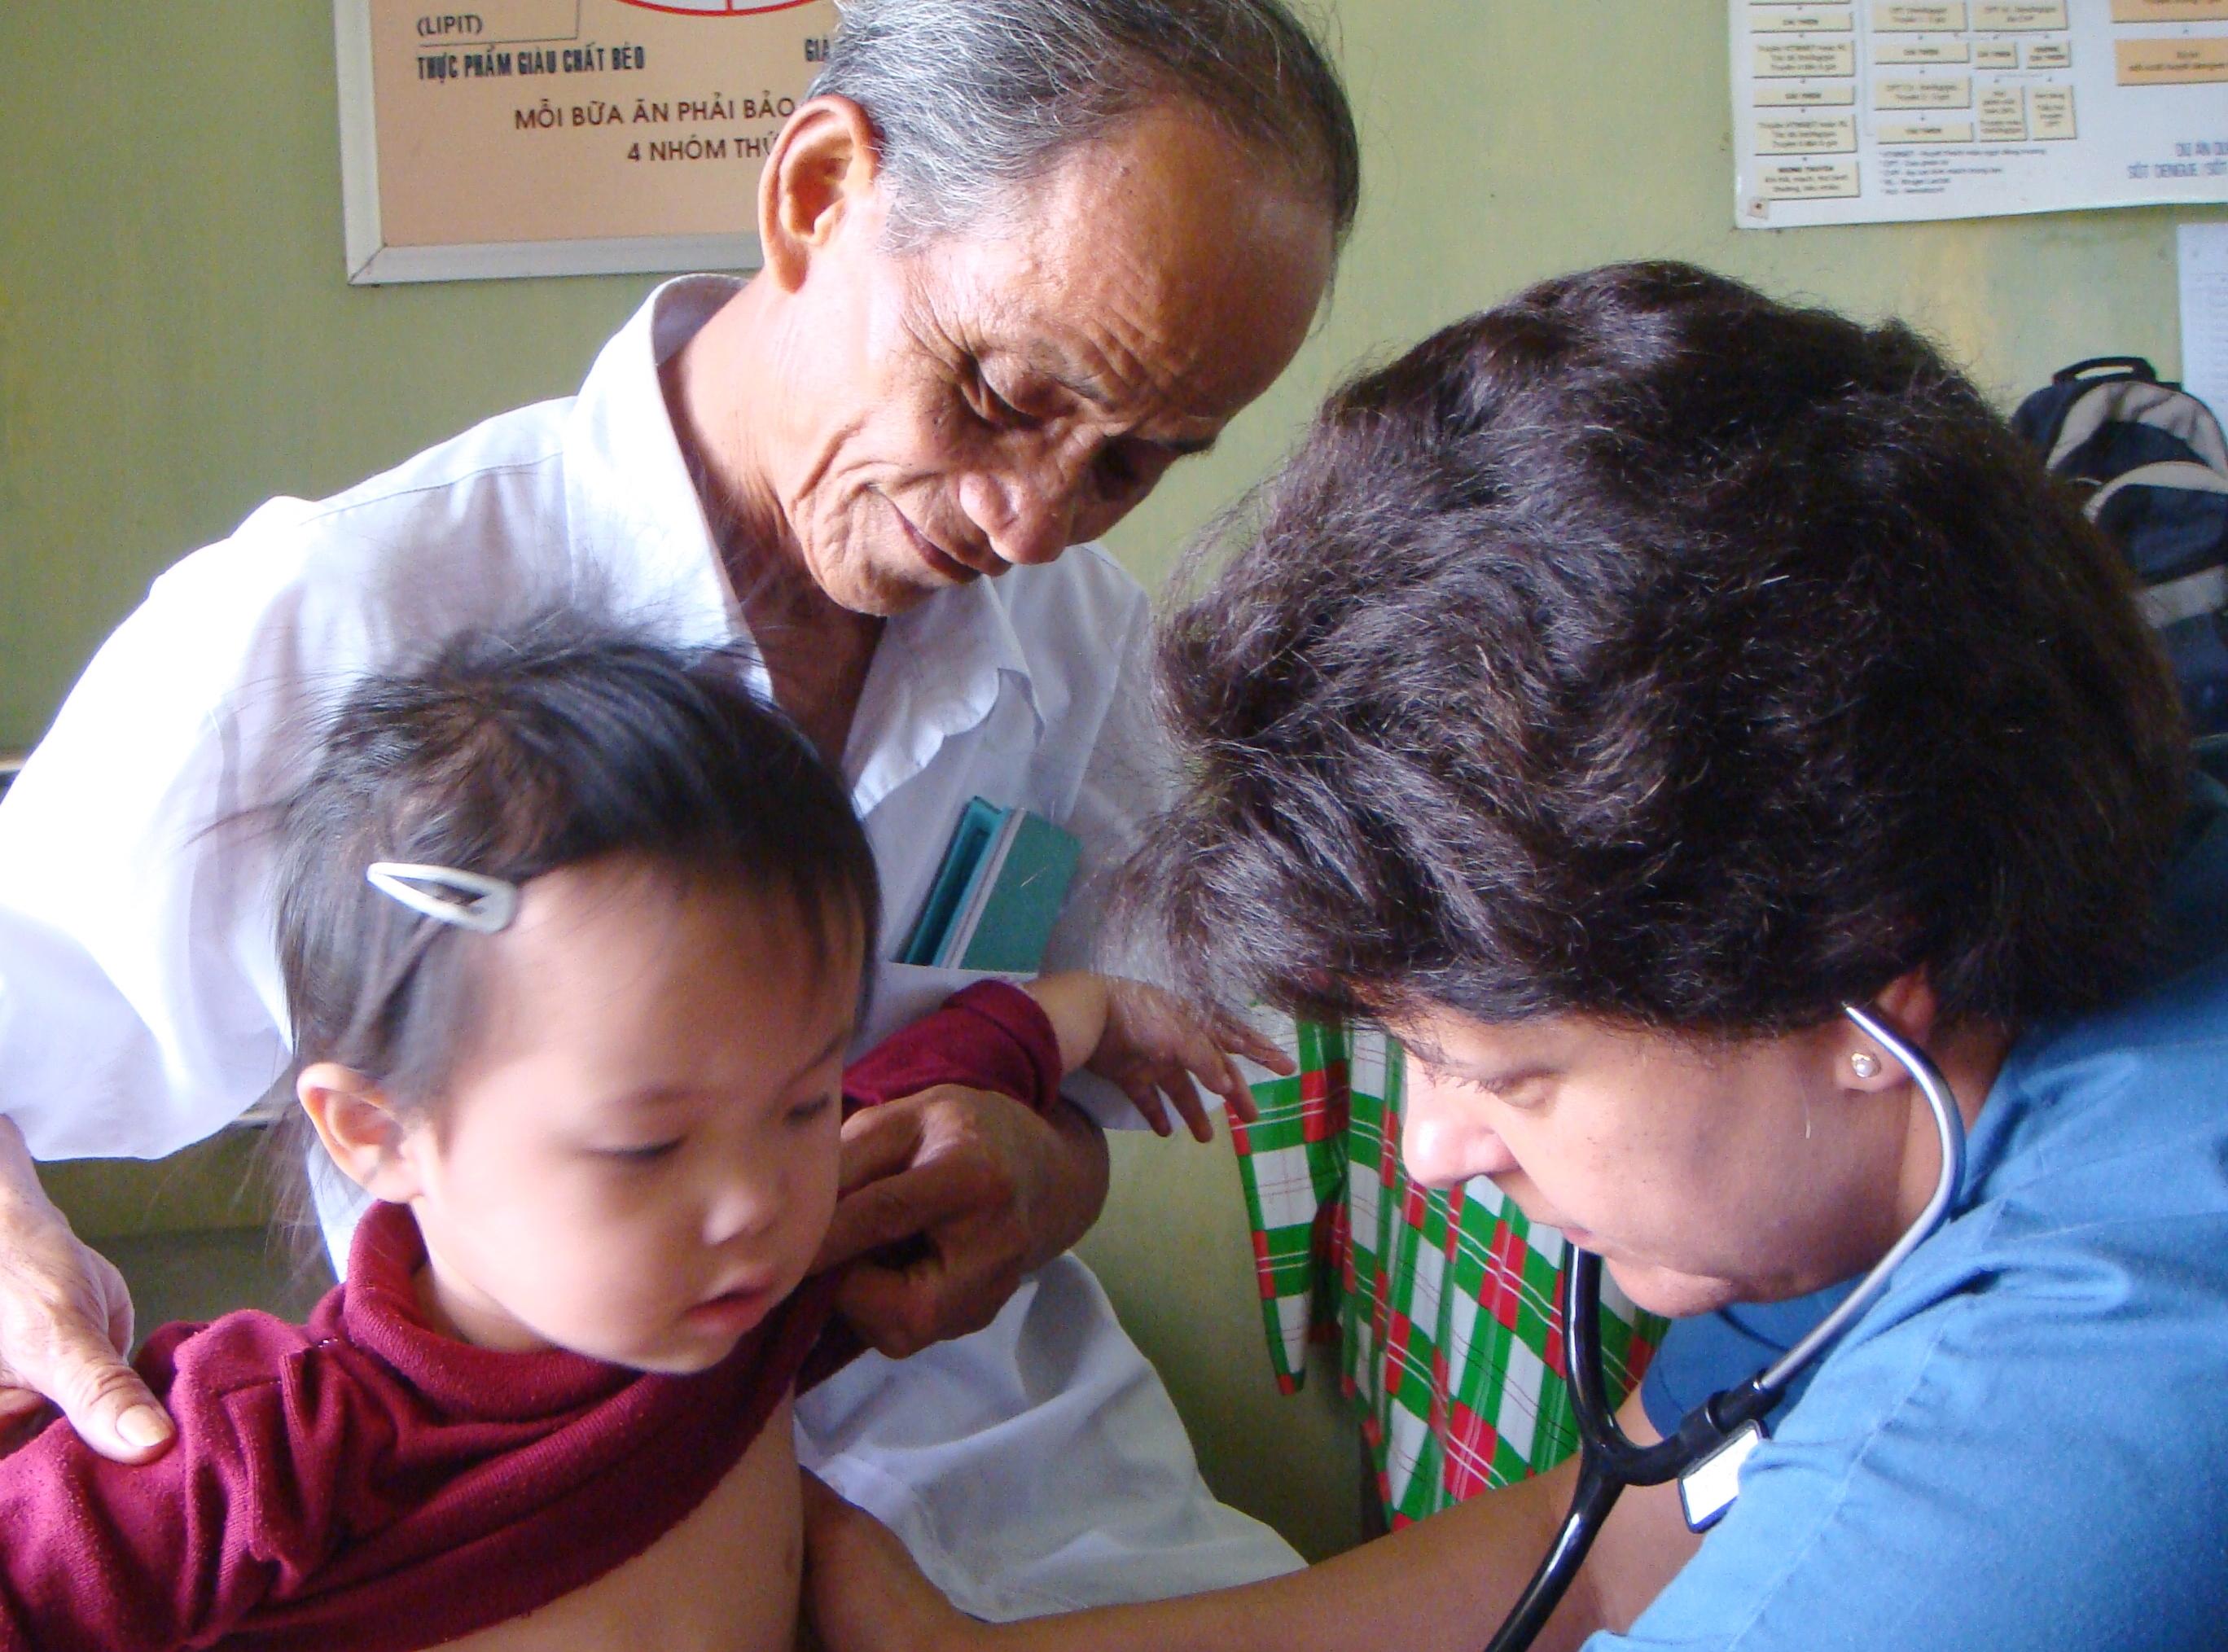 Dr. Aletha treating a child